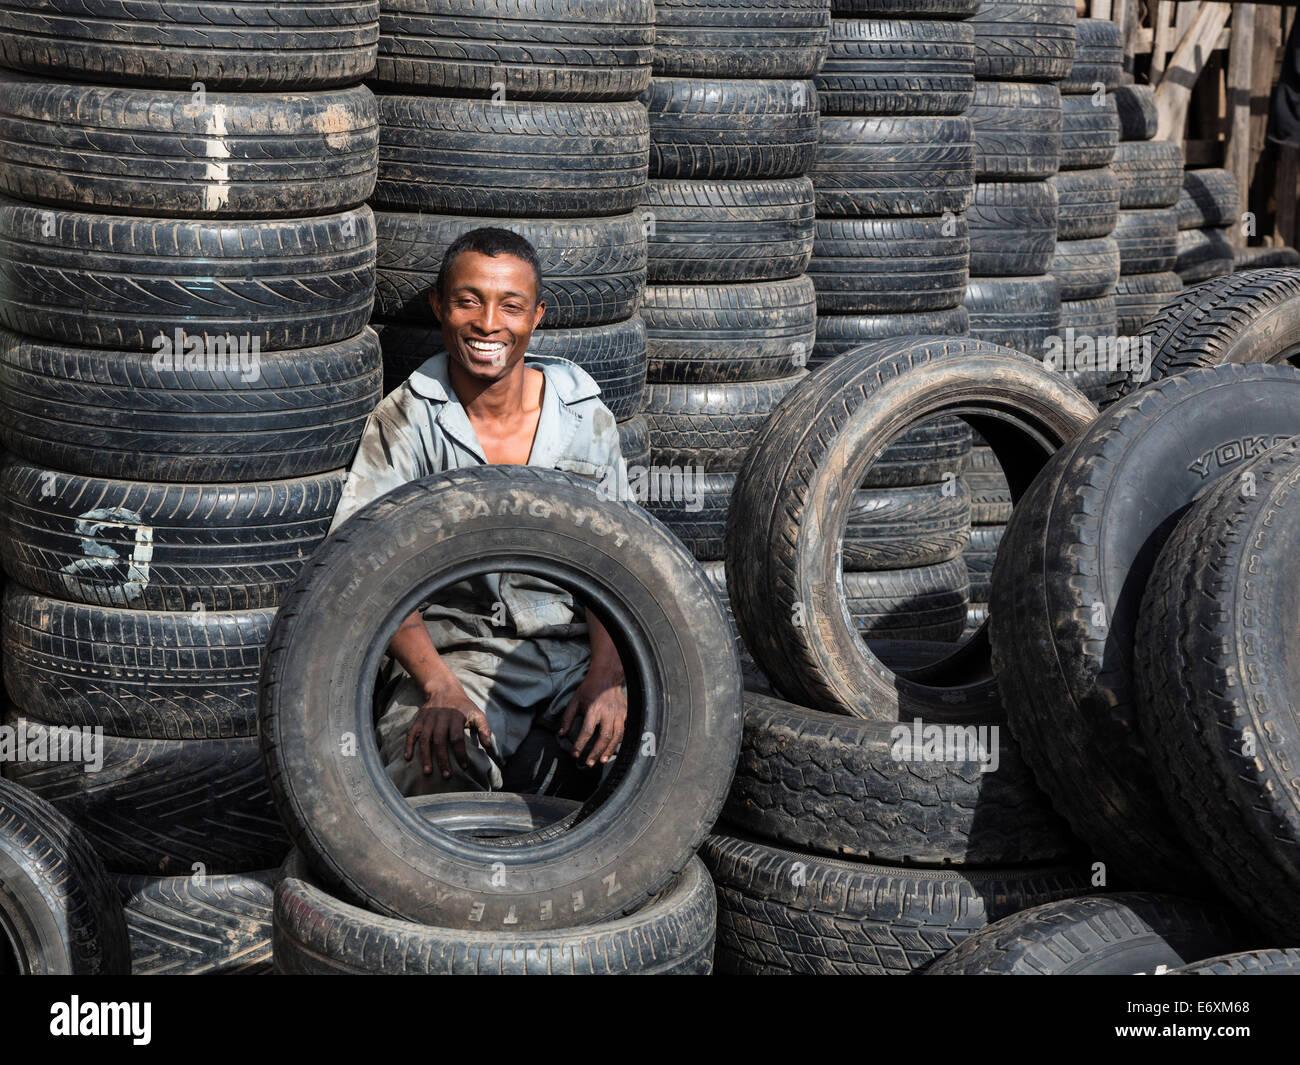 Reifen-Händler, Antananarivo, Hauptstadt von Madagaskar, Afrika Stockbild